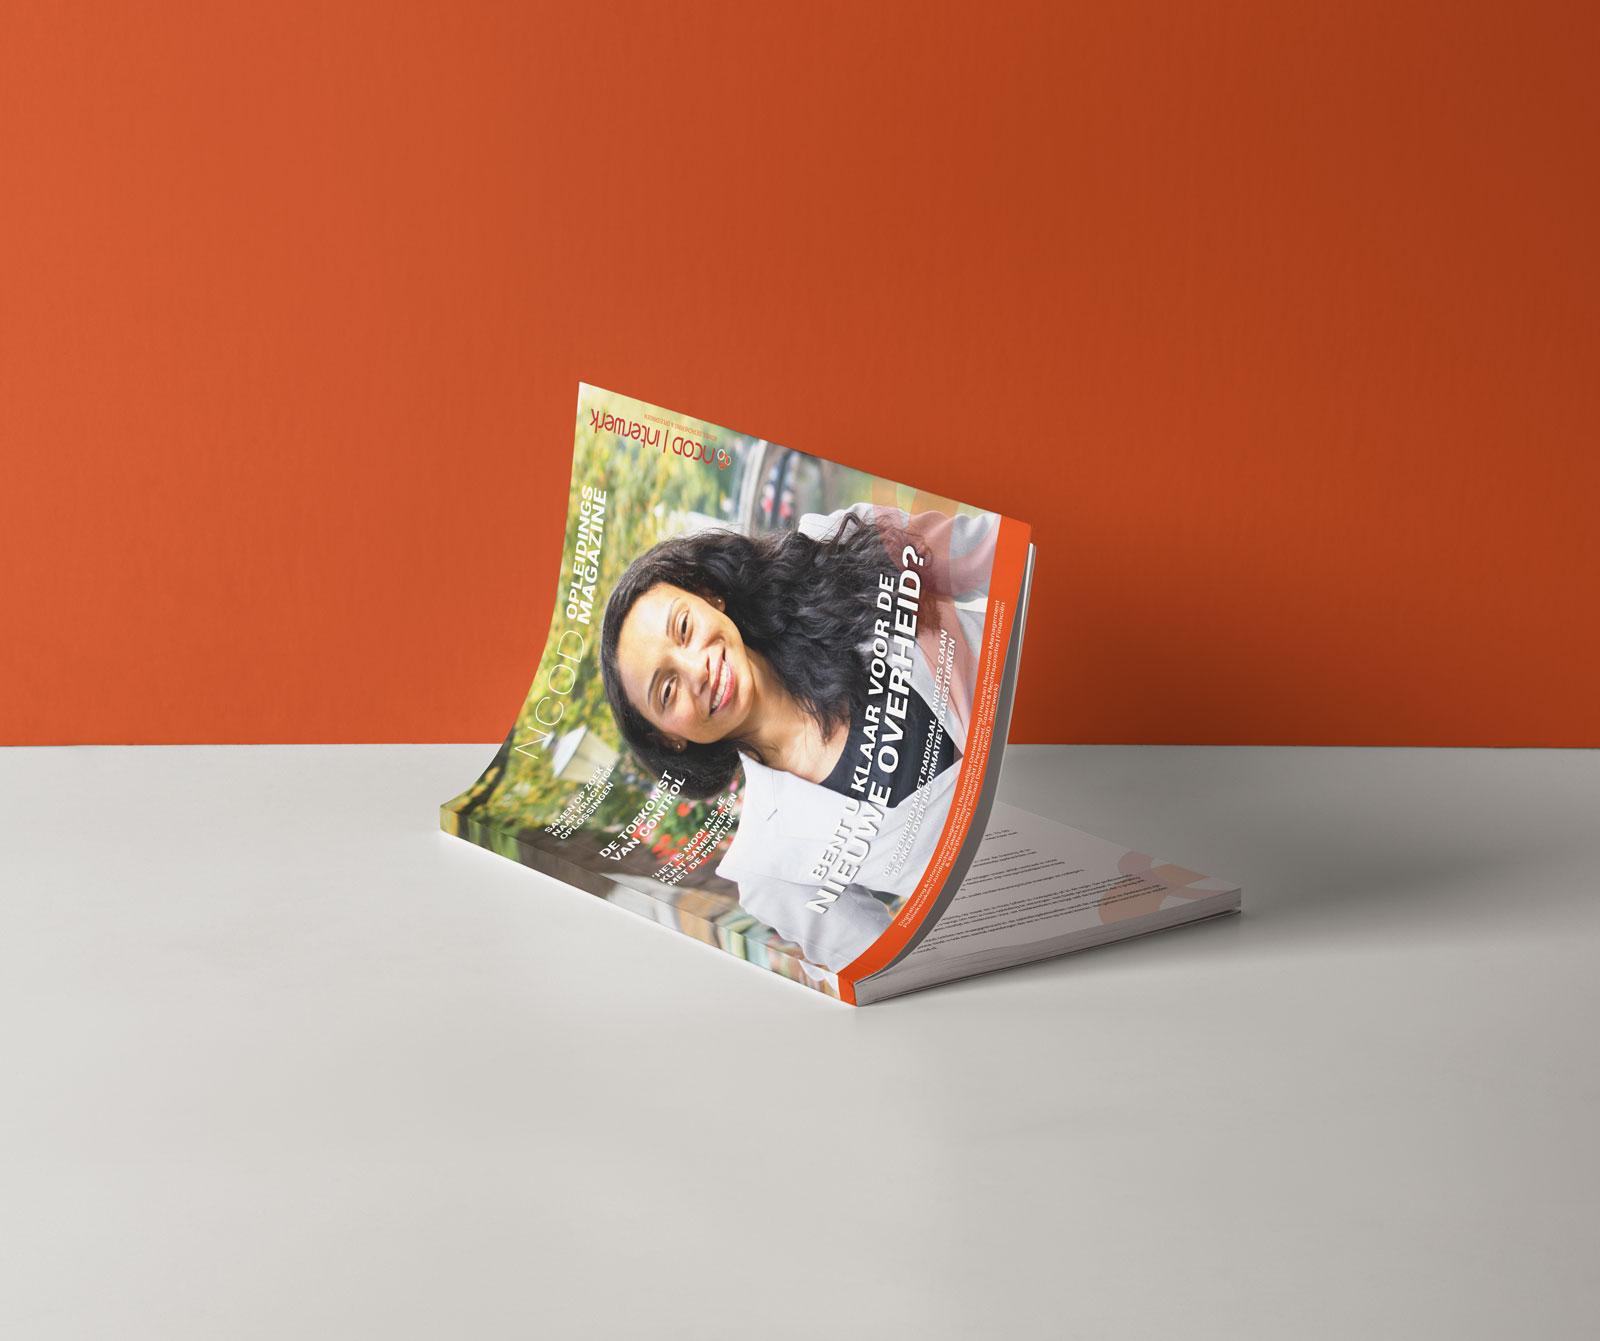 Beeldmarq - Grafische vormgeving & communicatie | Expertises | Magazine NCOD